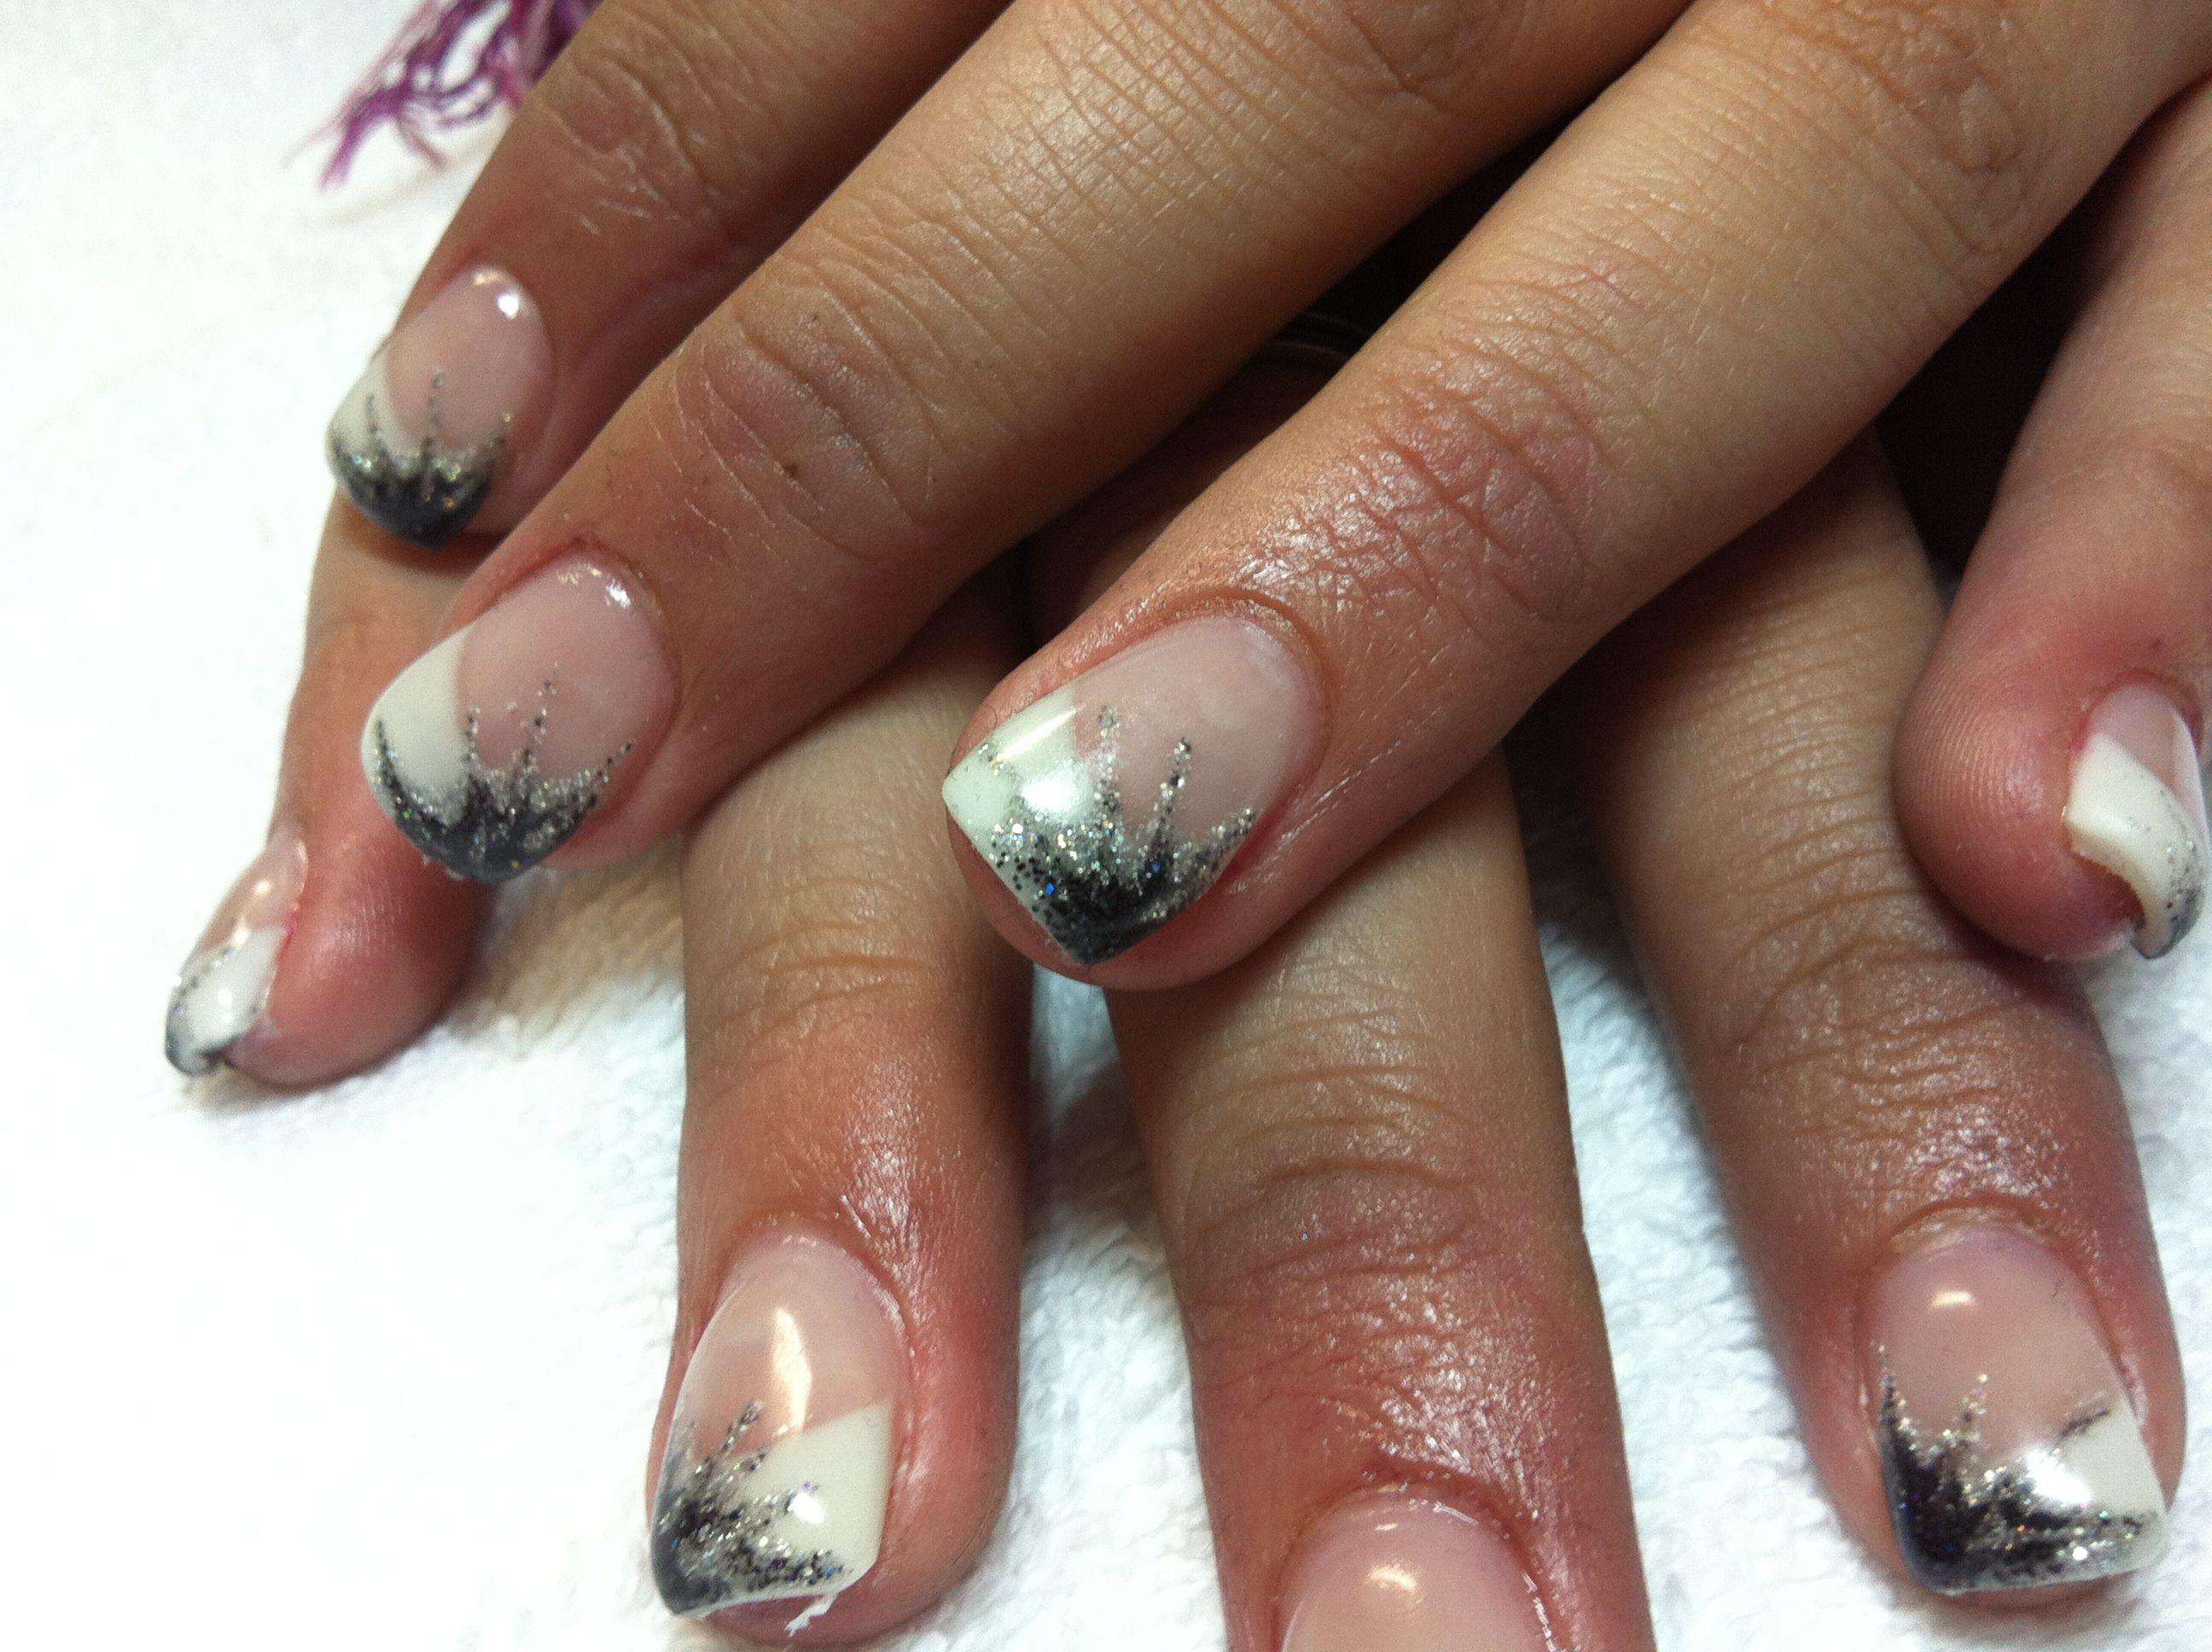 Black Tip Nail Designs | French Tip Nail Design Ideas | Nails ...